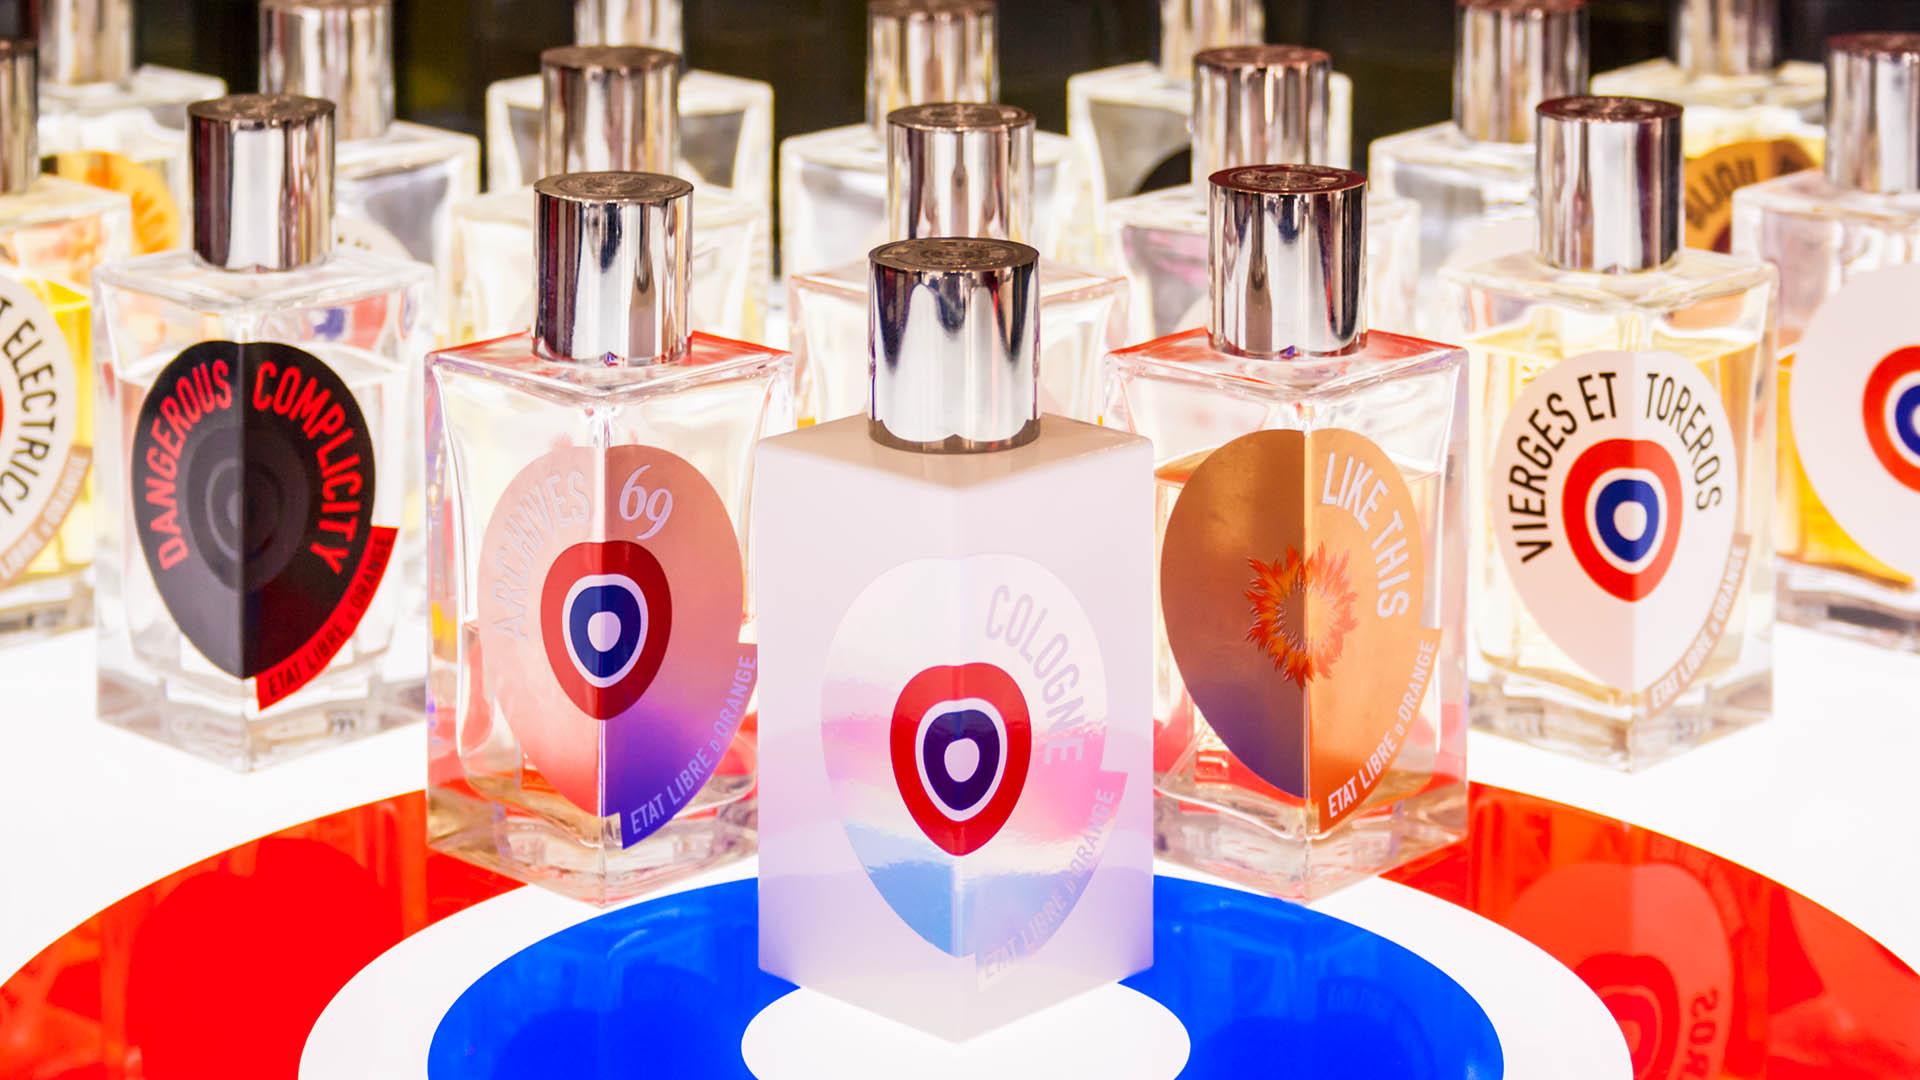 Широкий выбор парфюмерии от бренда ETAT LIBRE D'ORANGE